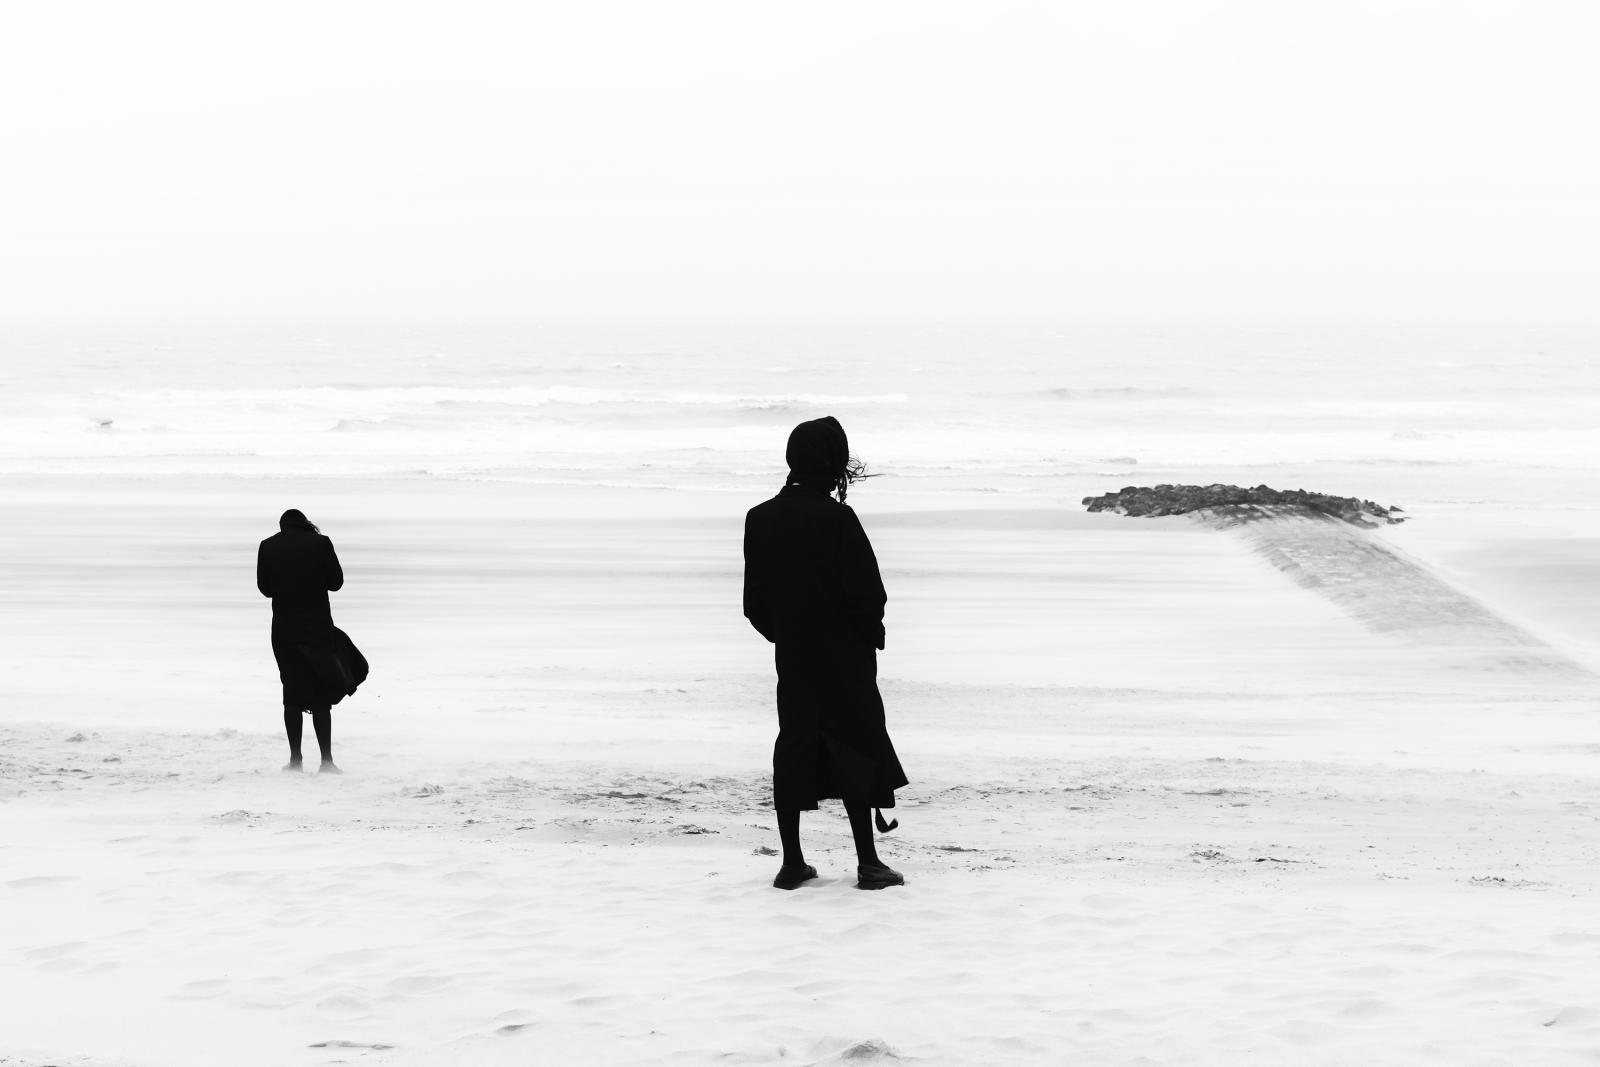 Photography image - Loading 02.Eddy-Verloes_Separate_islands.jpg